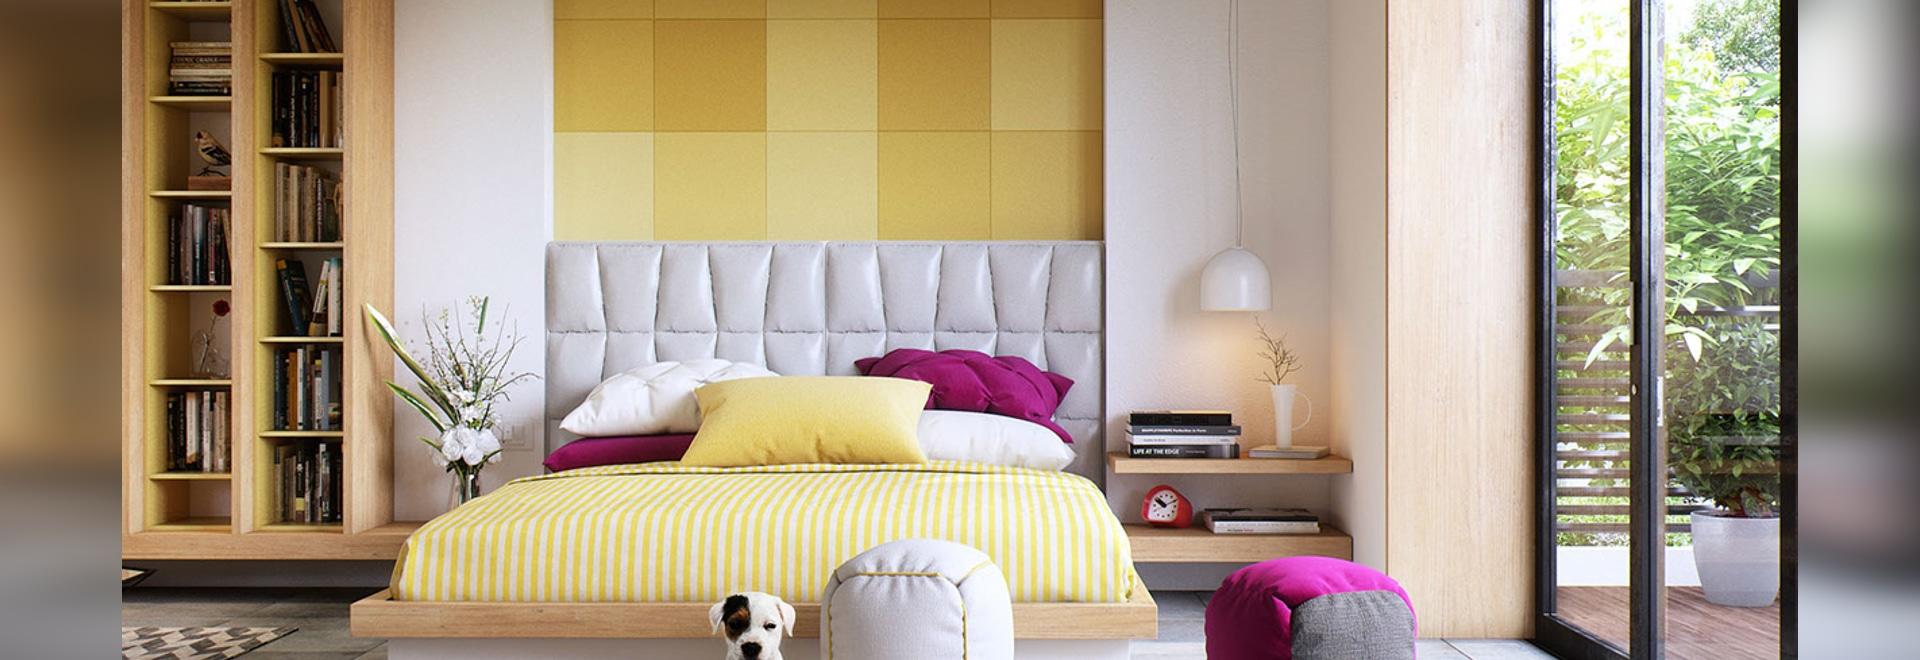 Schlafzimmer-Wand masert Ideen u. Inspiration - Delhi, India